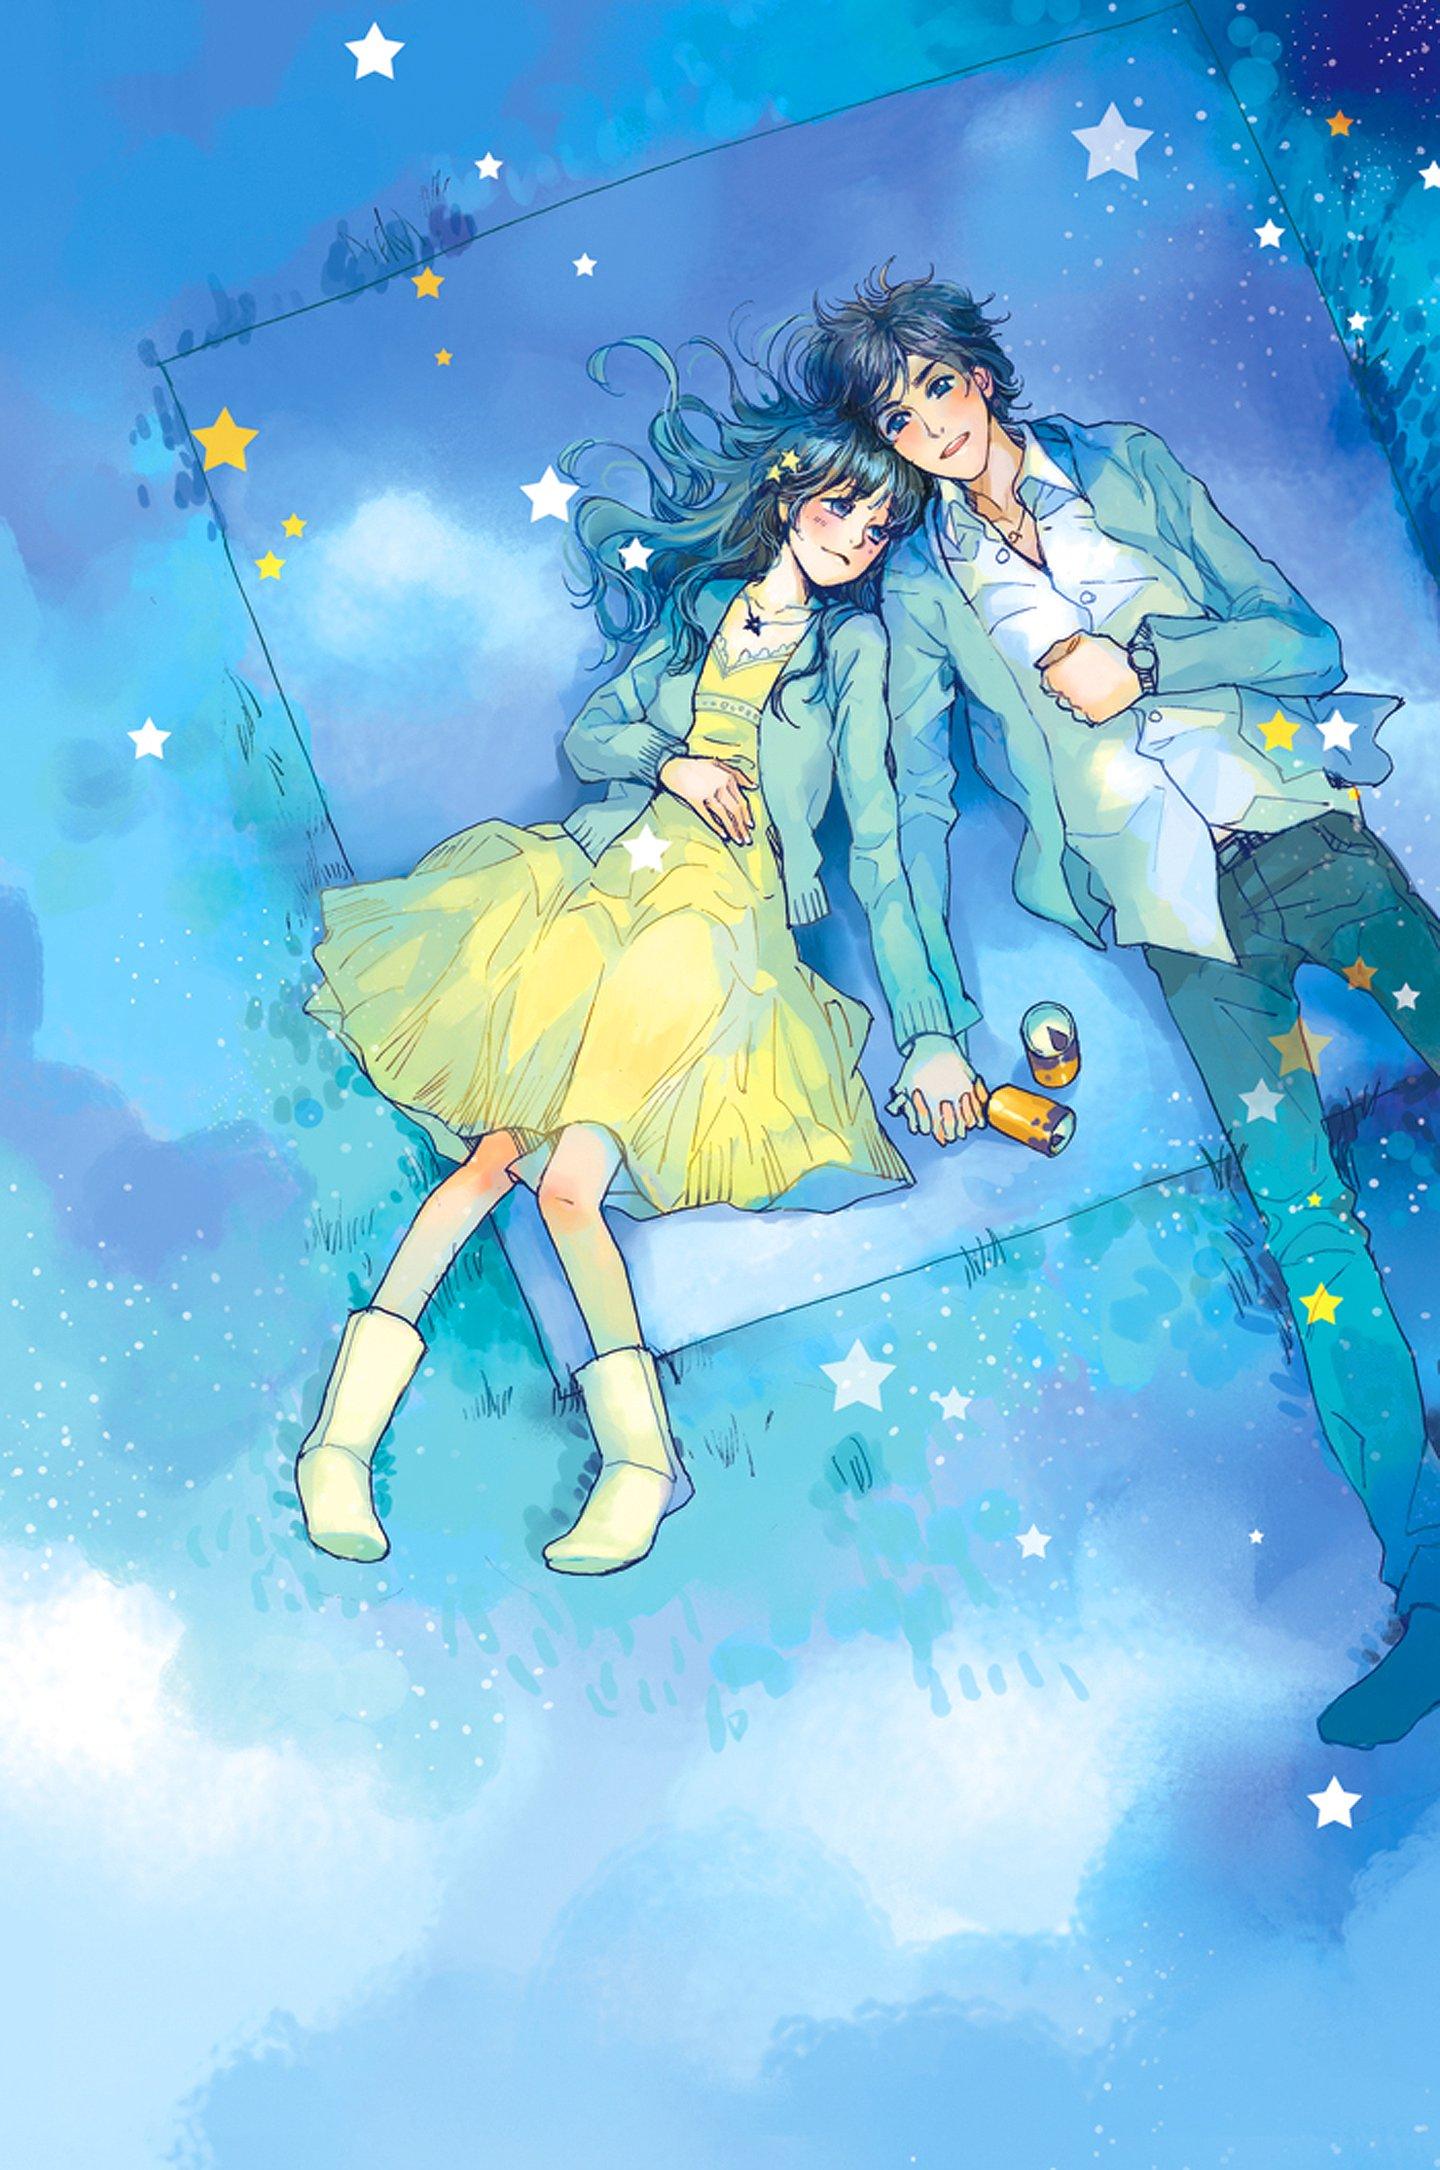 Anime couple yellow dress boy love stars romantic blue sky - Anime couple pictures ...